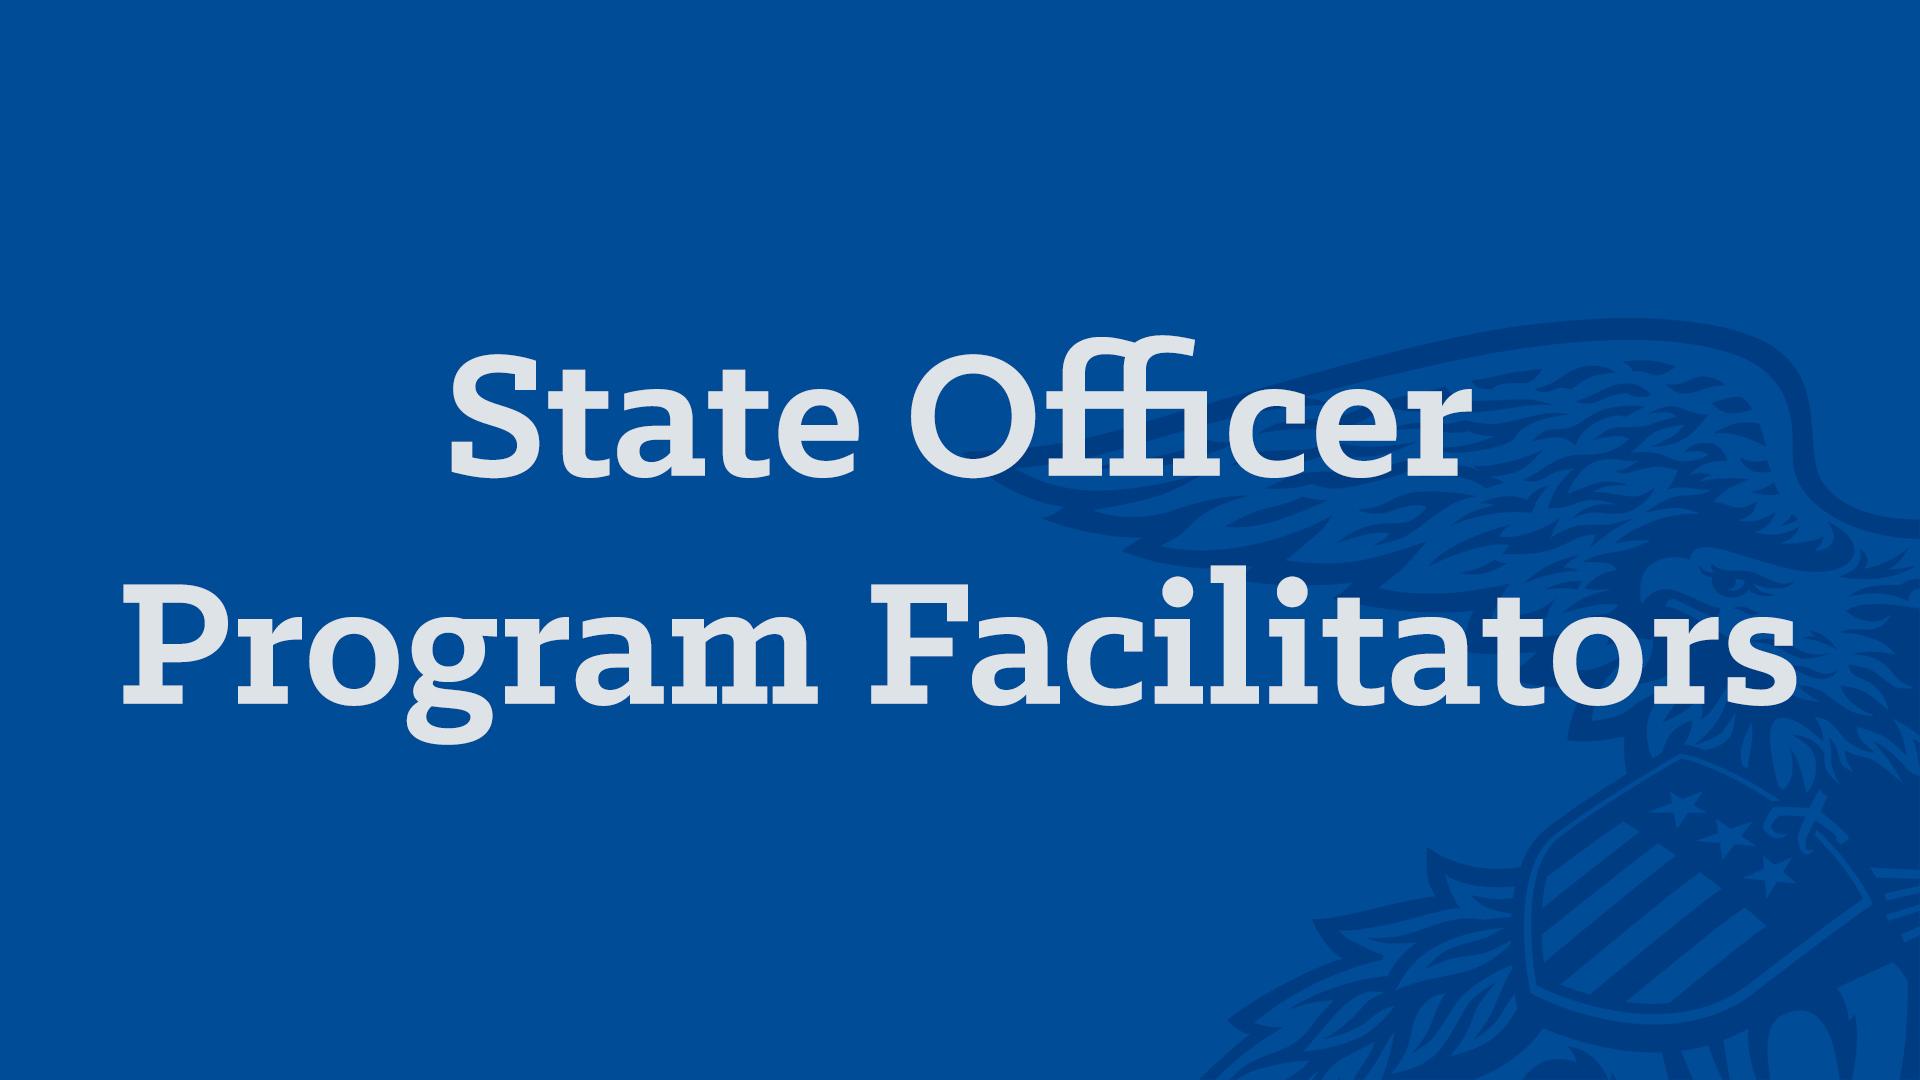 State Officer Program Facilitators